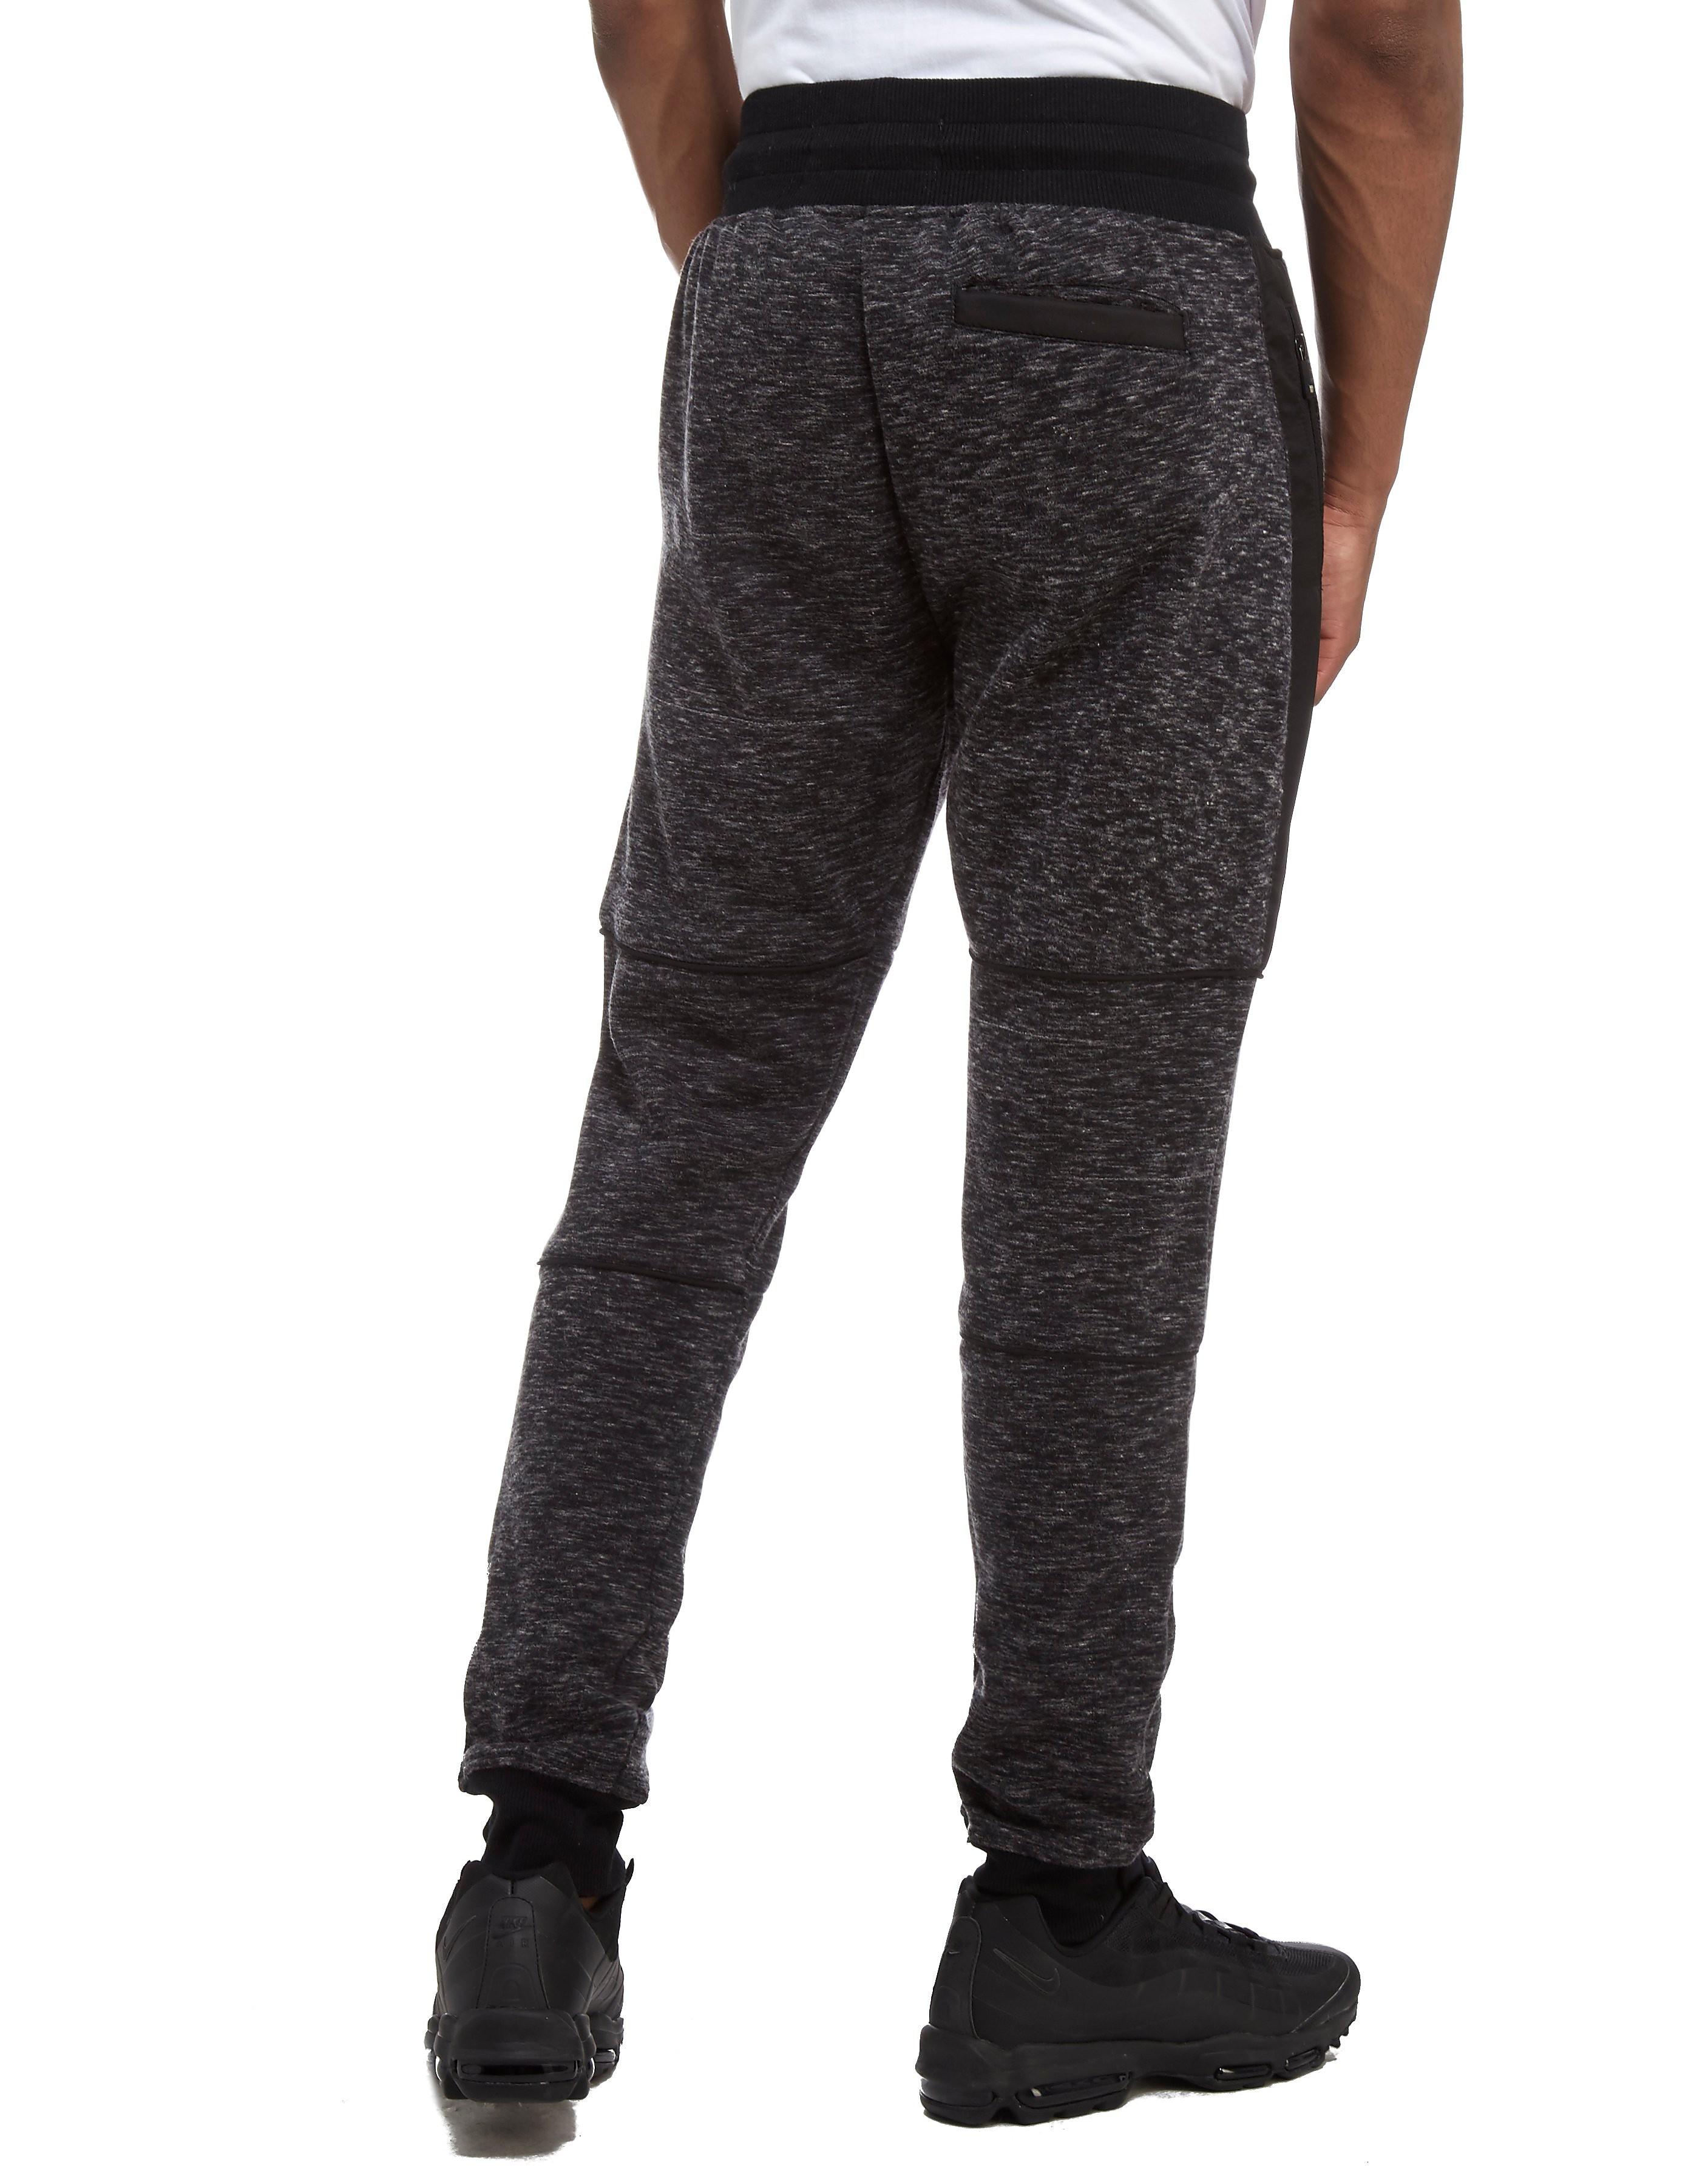 Nanny State Vortex Pants